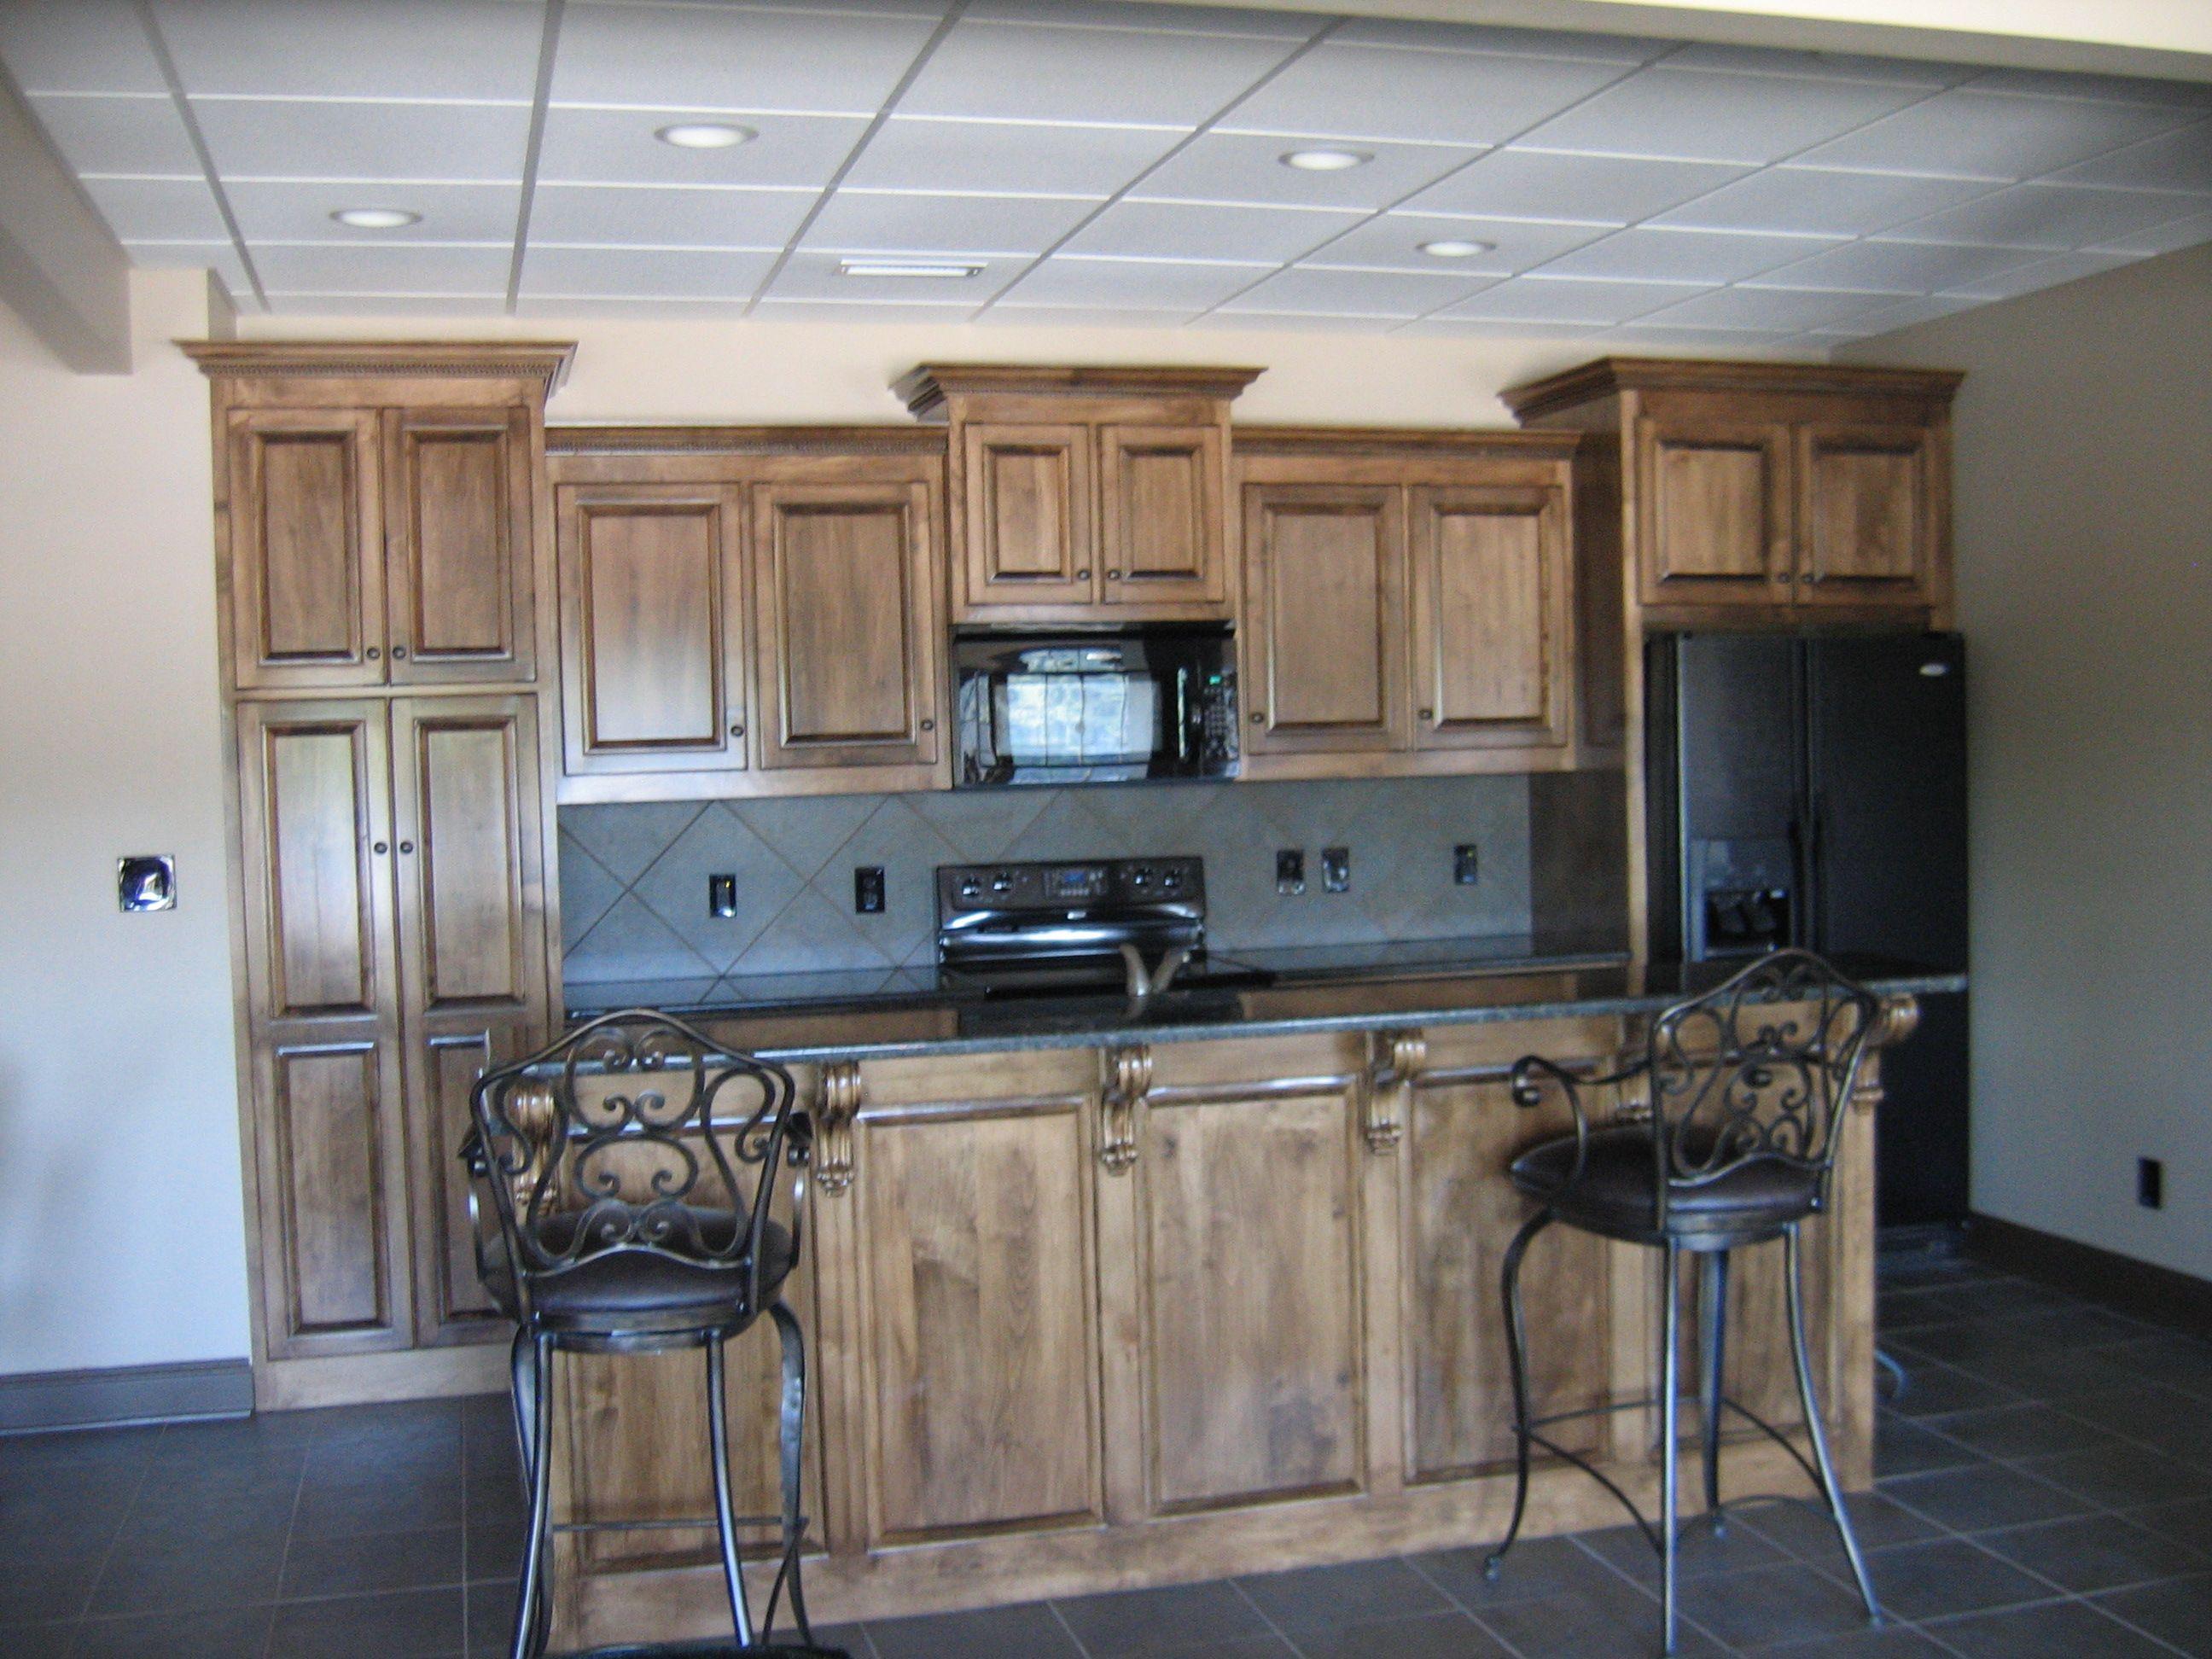 Free estimate kitchen cabinets - Basement Kitchen Basement Kitchen Cabinets Kitchen